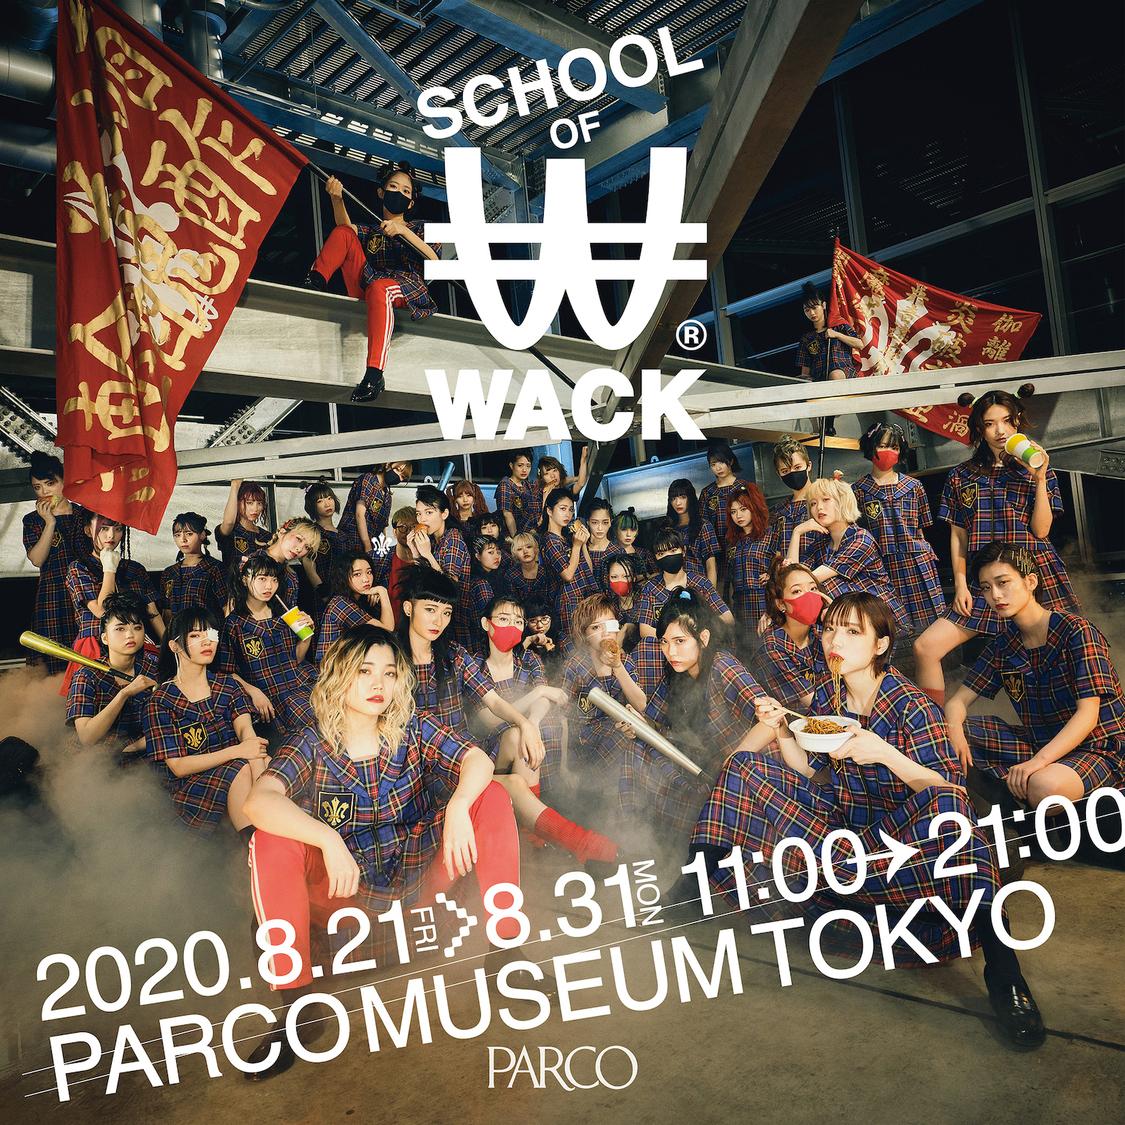 WACK所属アーティスト大集合の展覧会<SCHOOL OF WACK>、メンバー来場イベントのオンライン生配信決定!